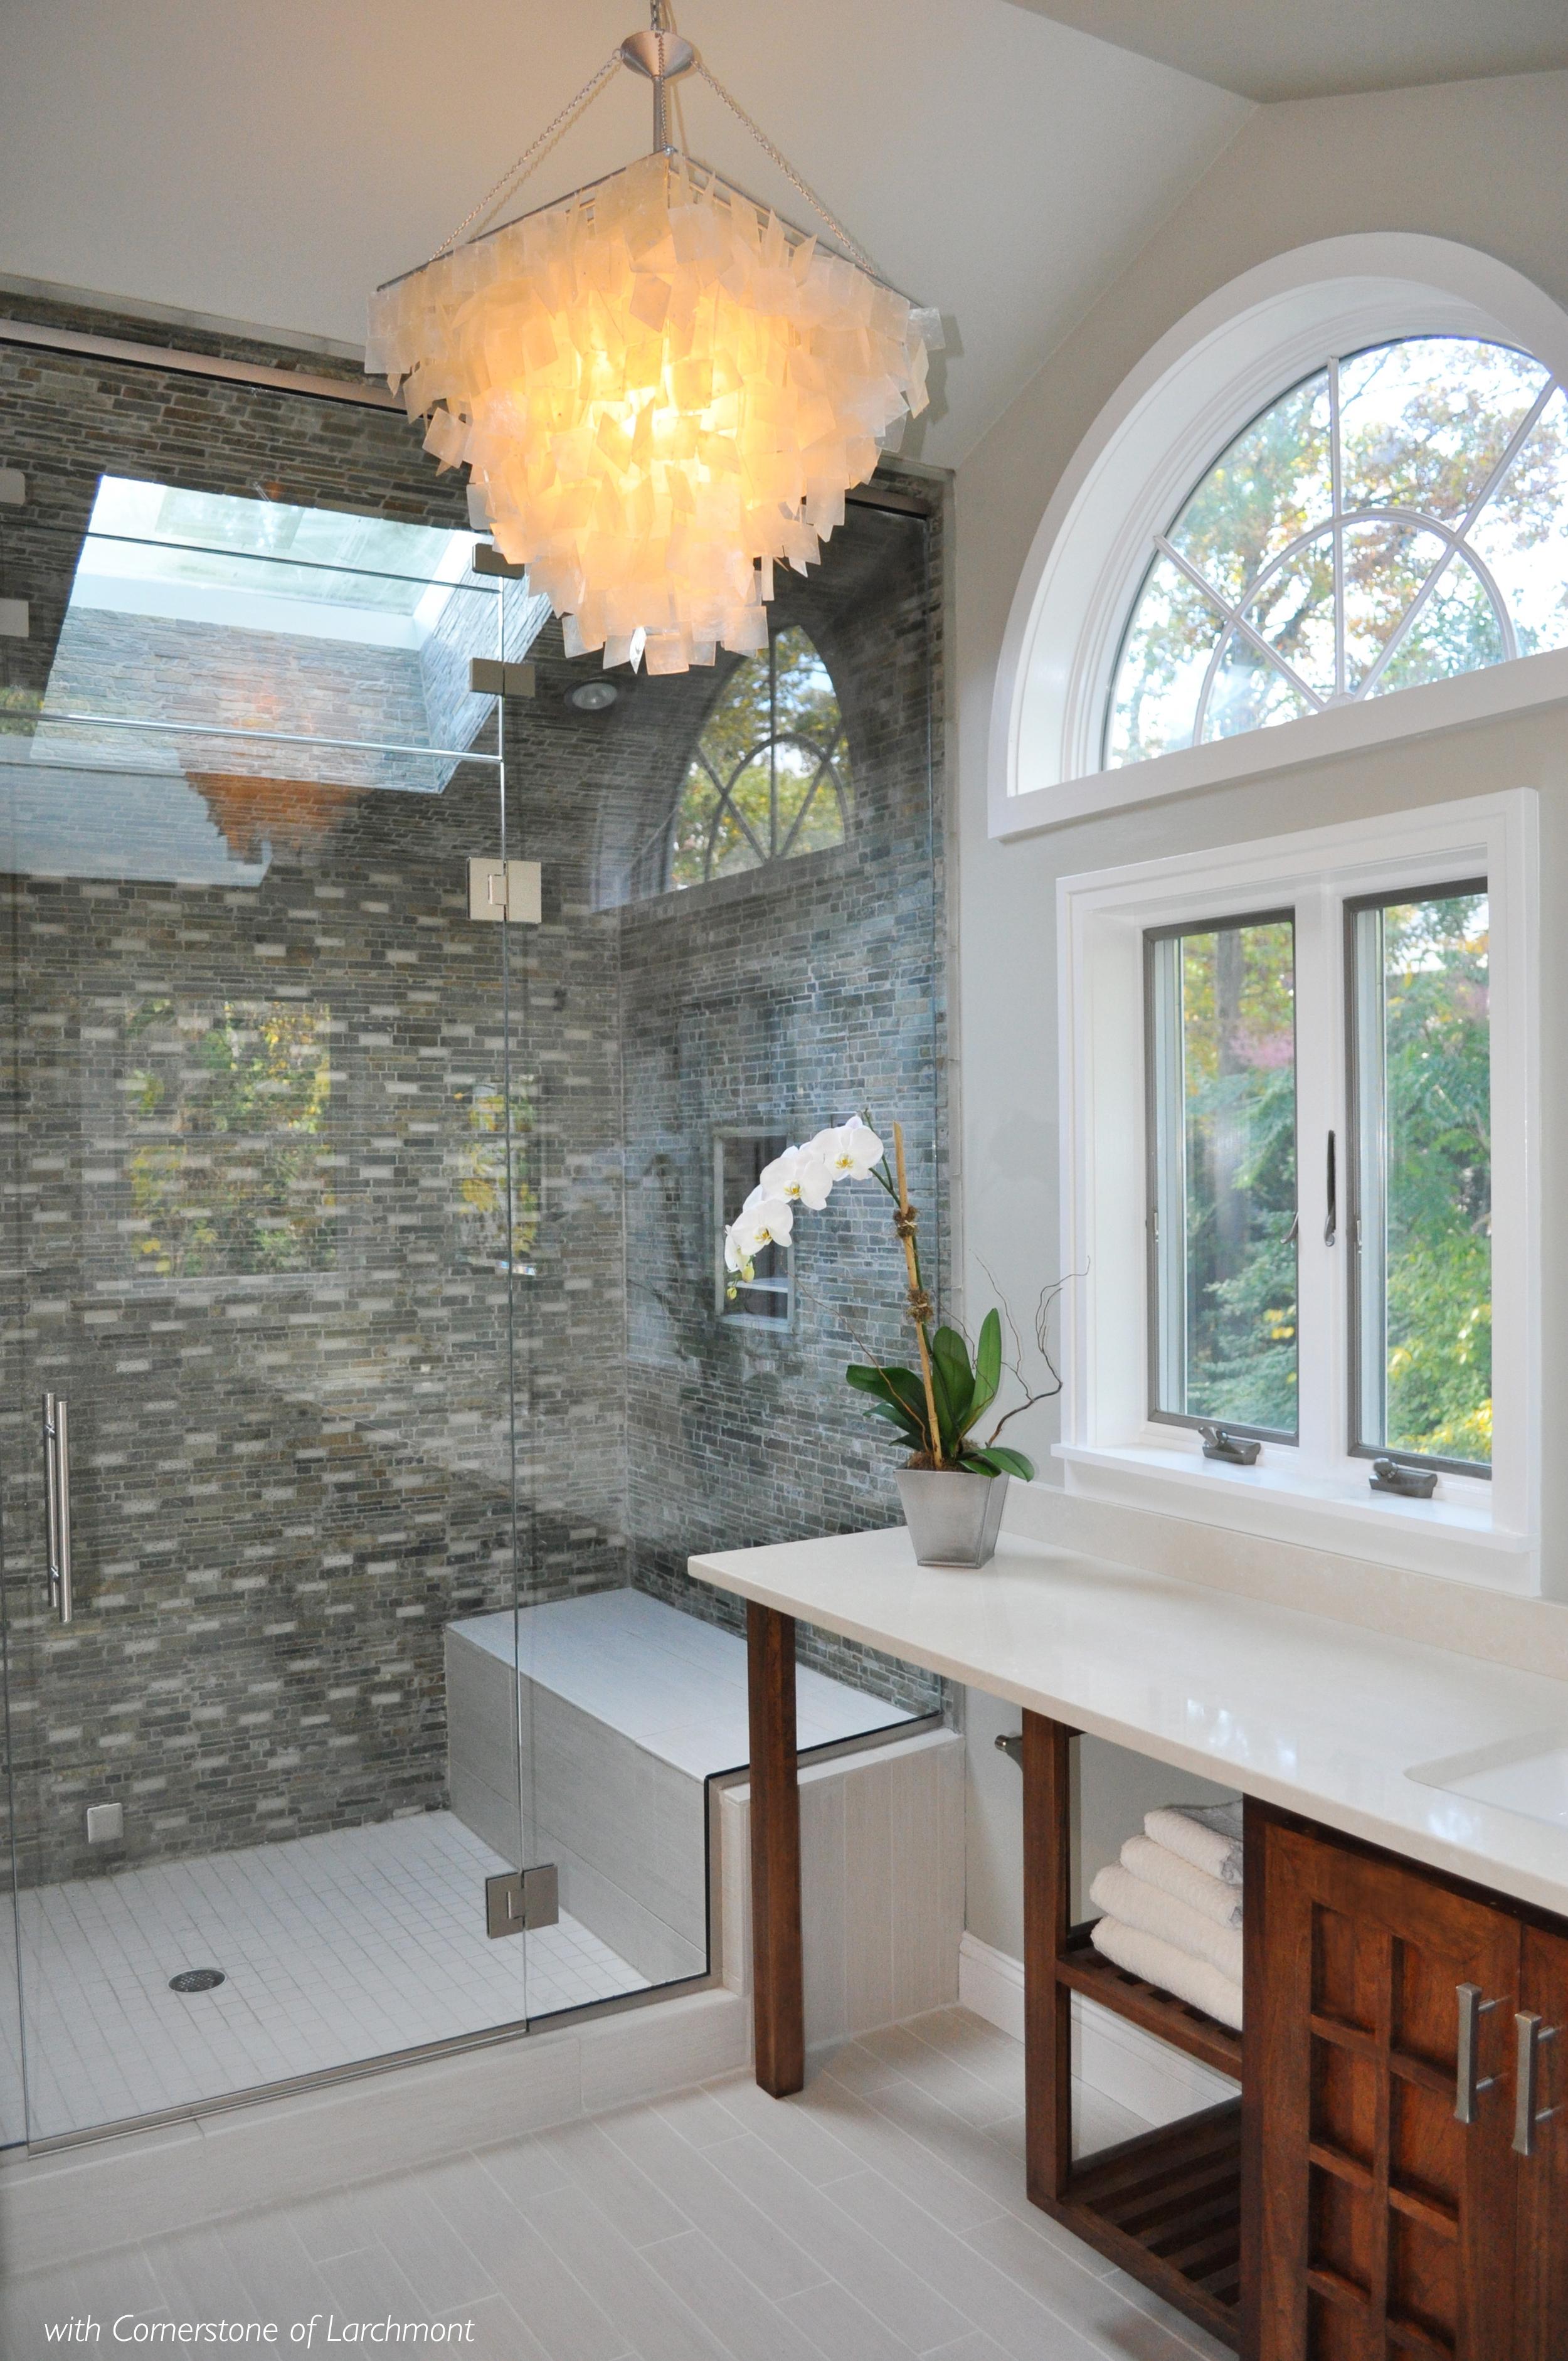 MasterBath_Bathroom Renovation_Bathroom Remodel_Bathroom Slate and Glass Tiles_Bathroom Lighting_Kim A Mitchell with Cornerstone of Larchmont.jpg